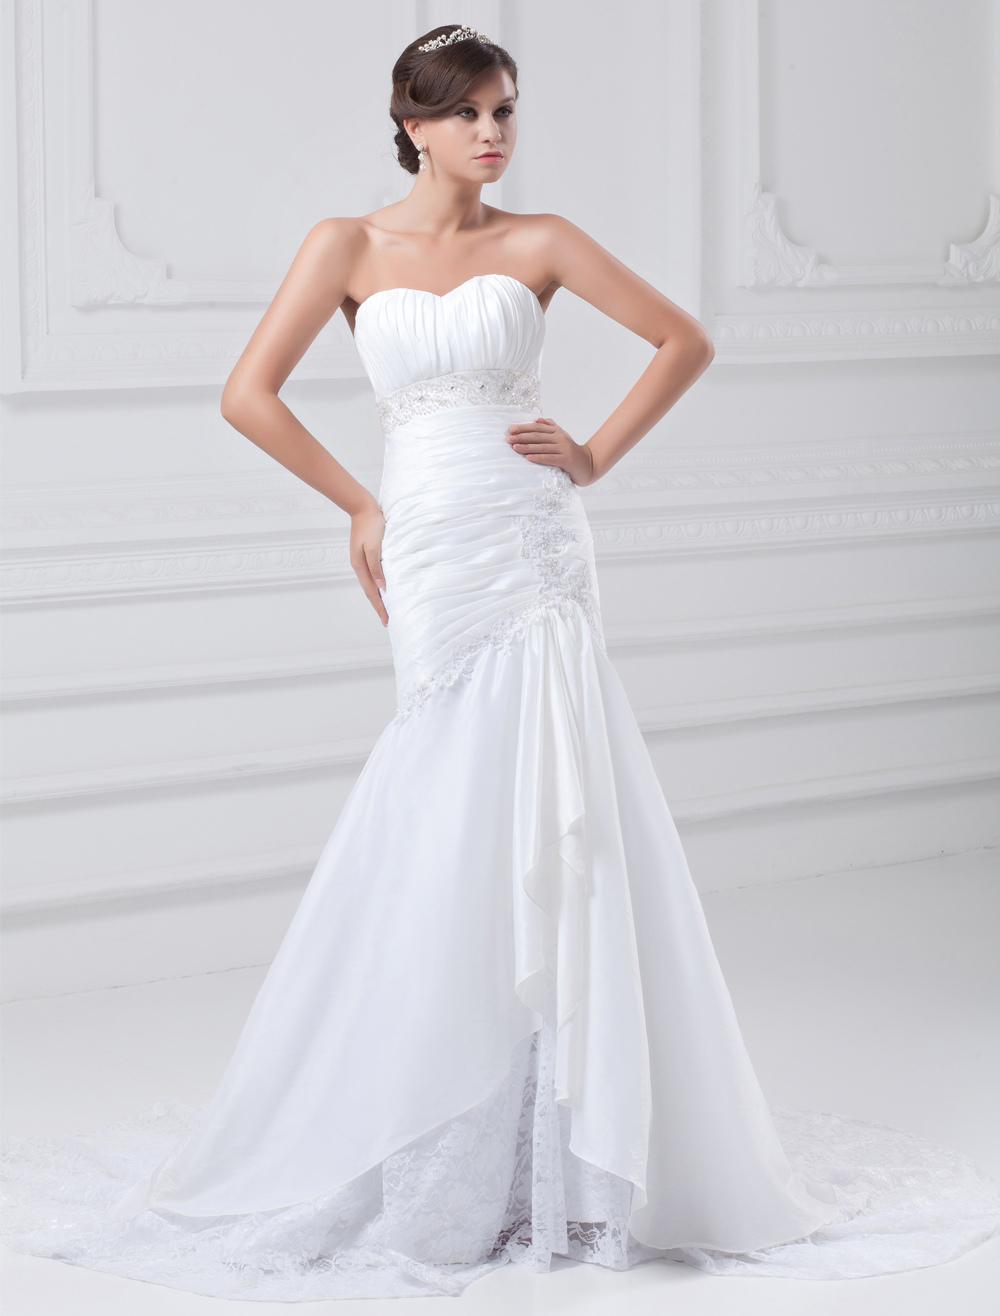 White Mermaid Beading Taffeta Wedding Dress For Bride photo